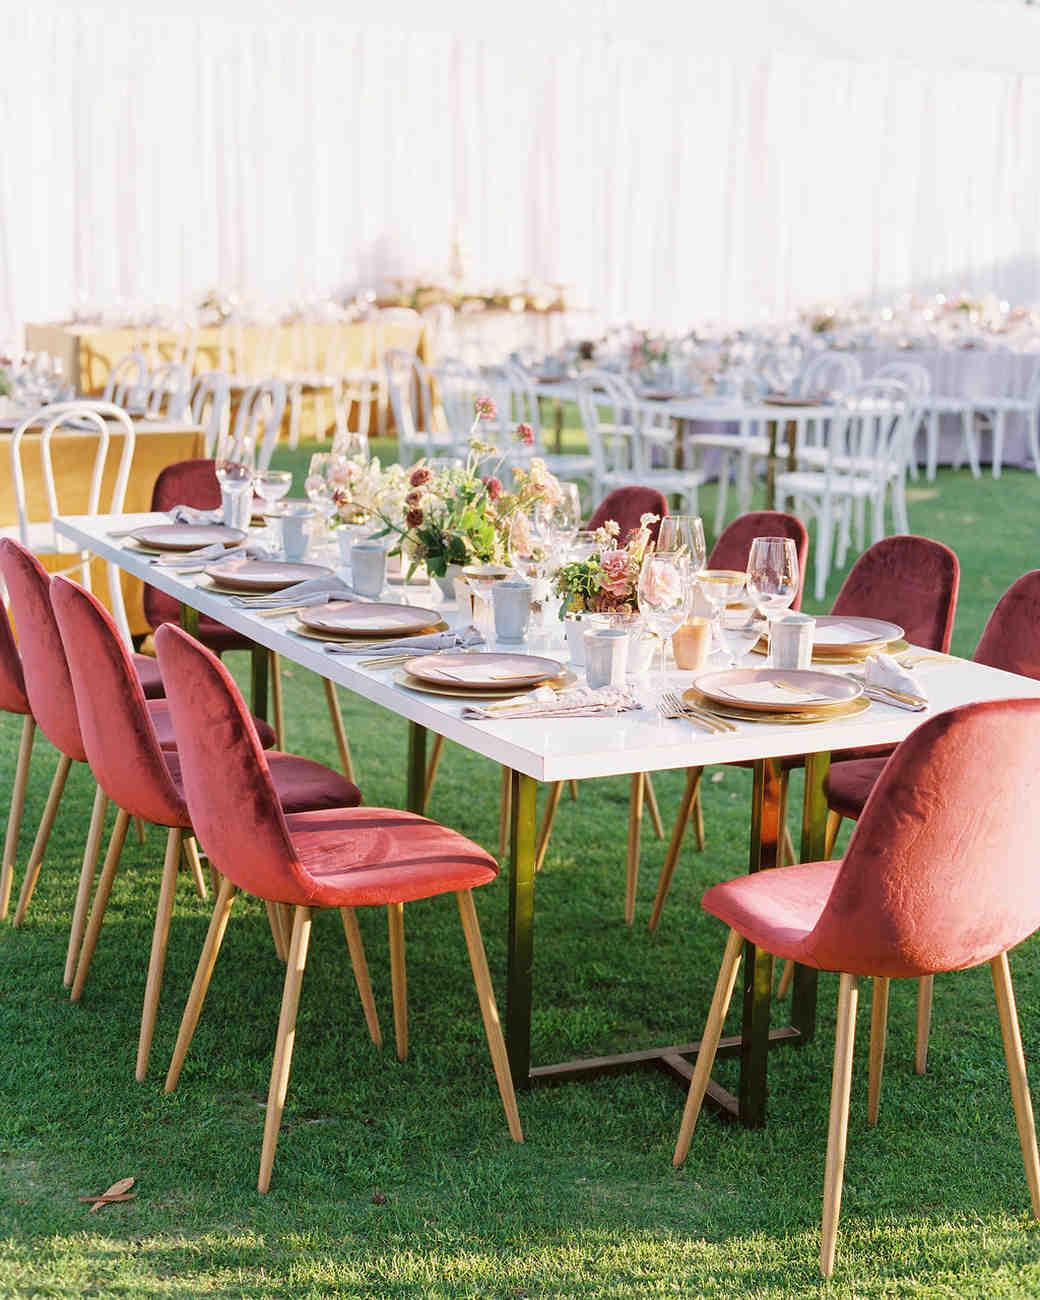 paige zack wedding reception on lawn